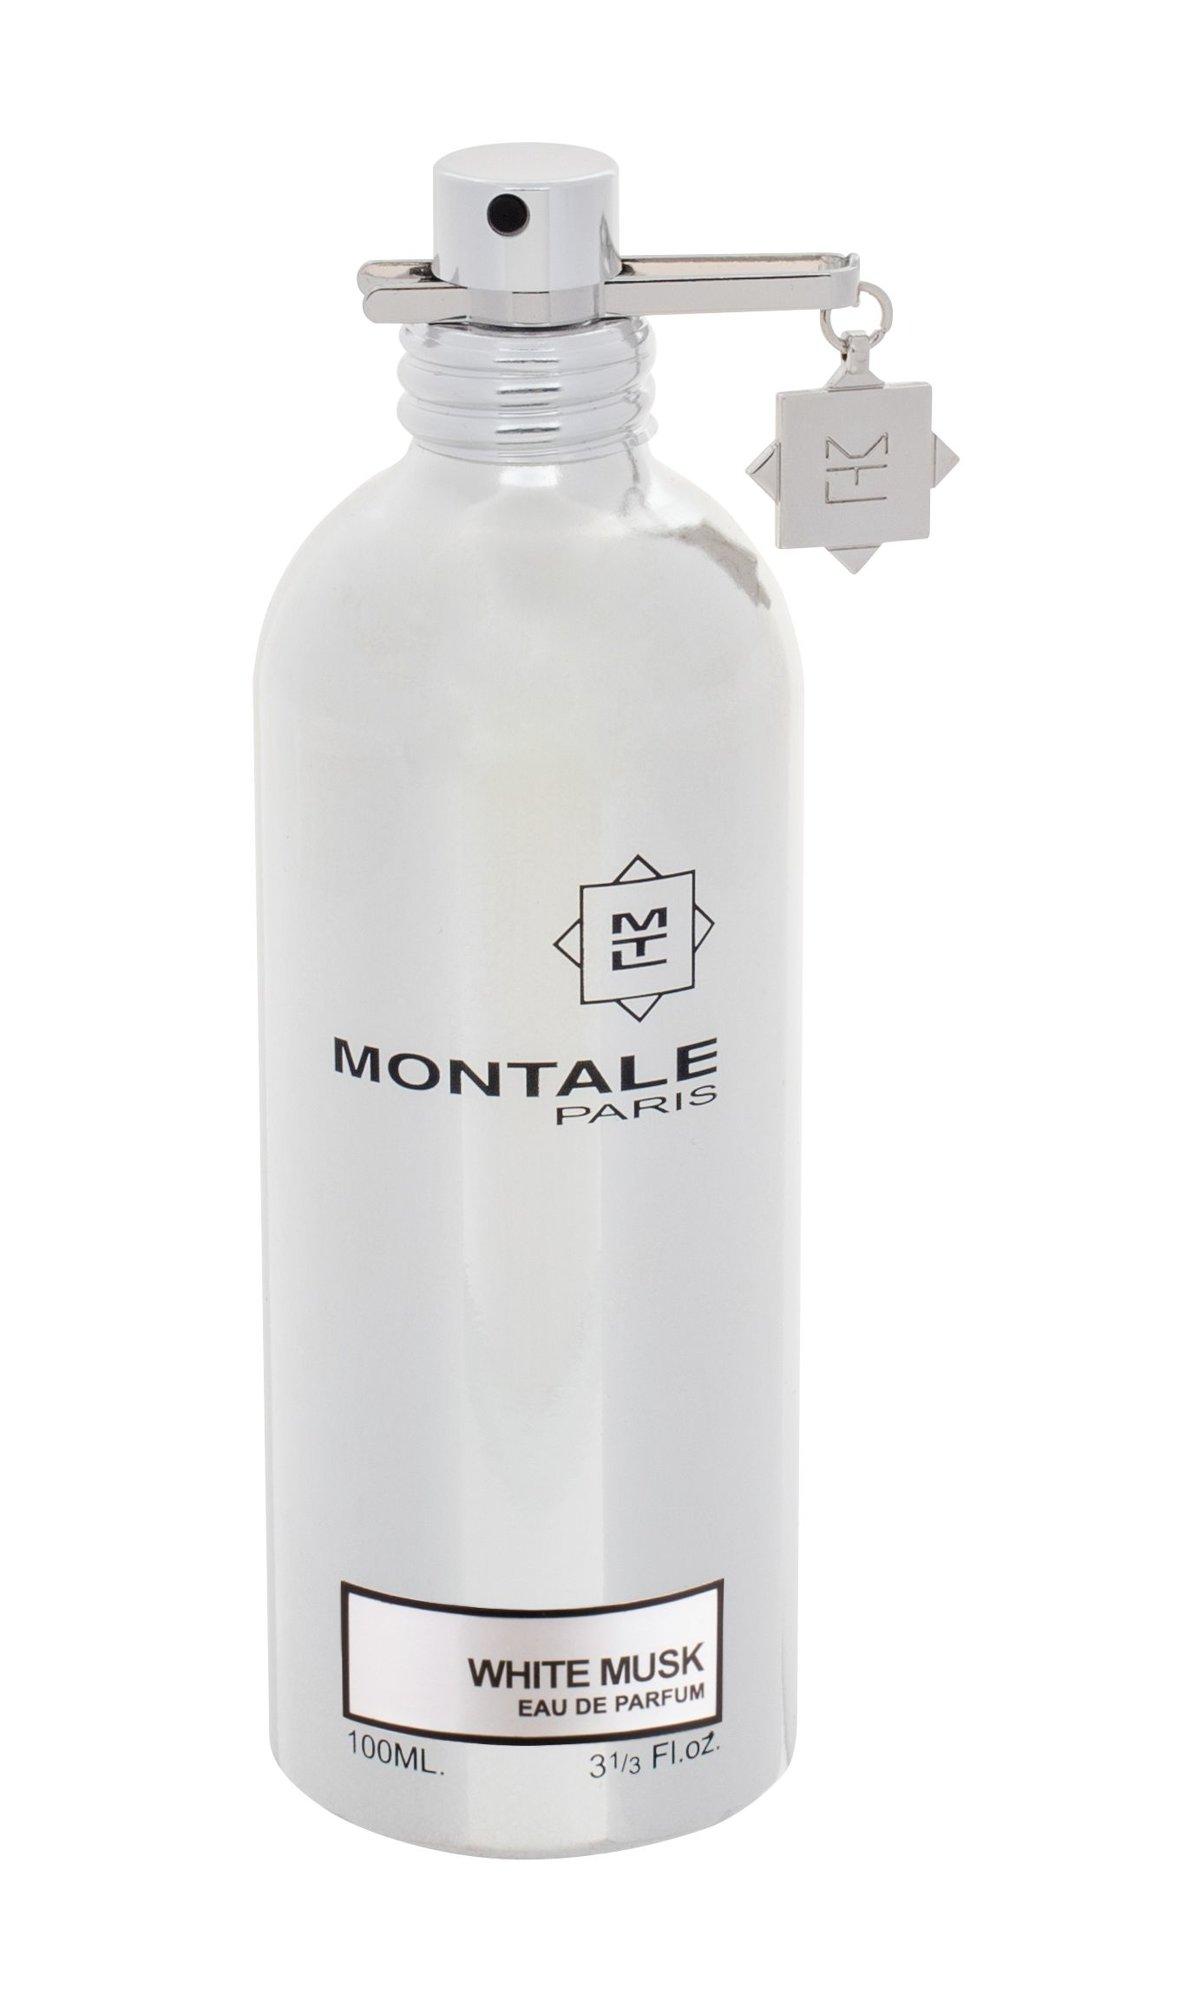 Montale Paris White Musk EDP 100ml